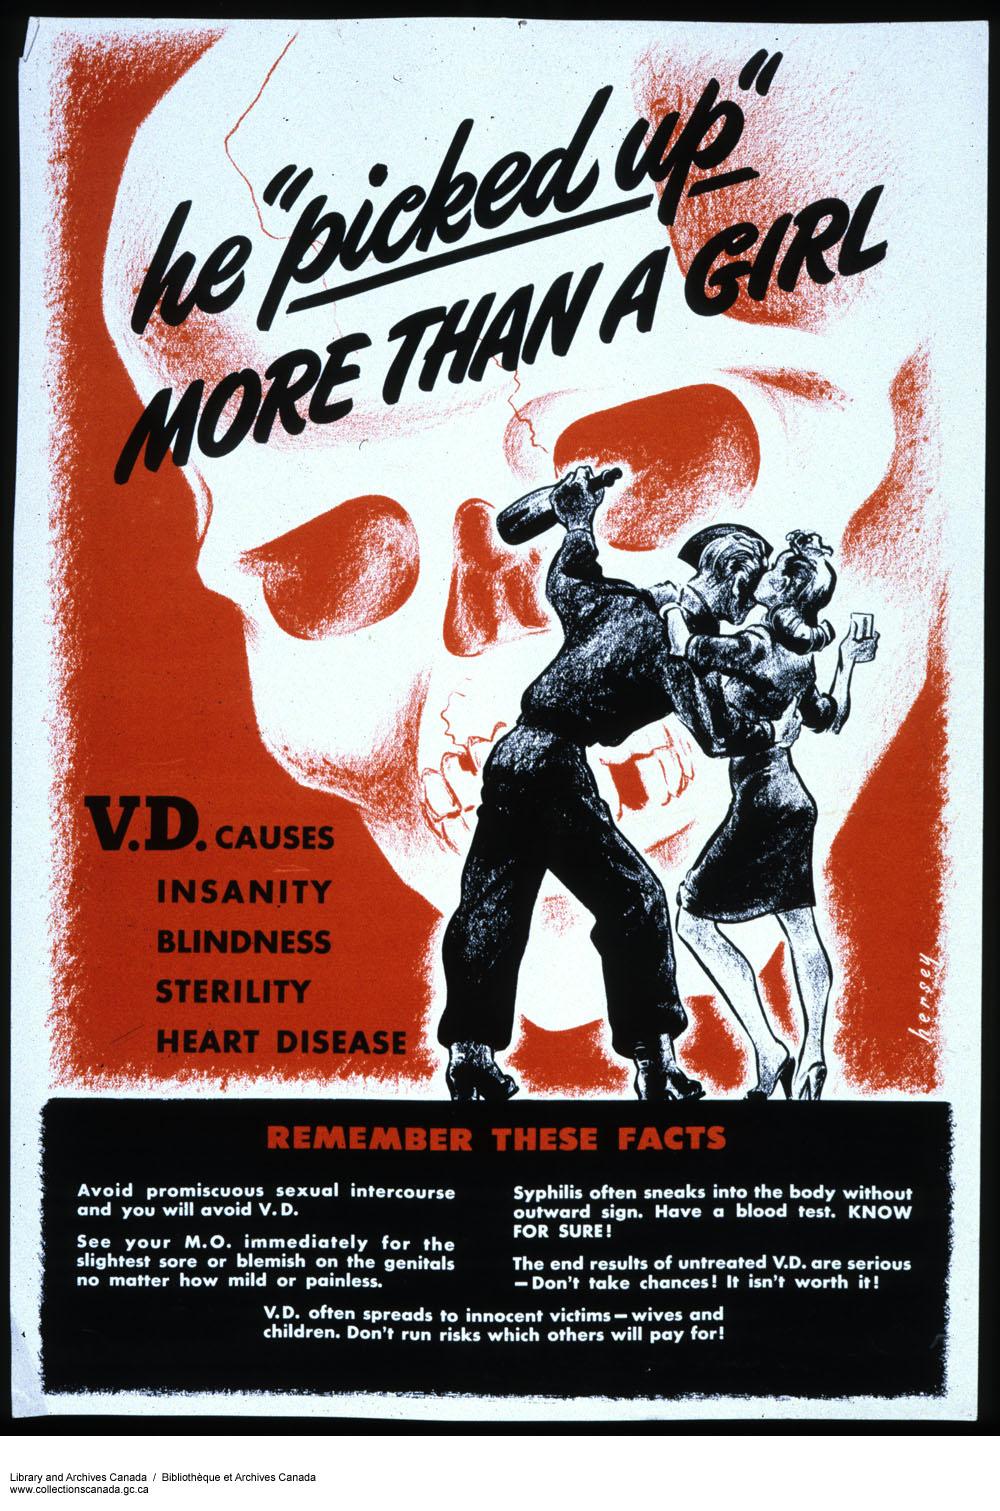 Poster cautioning against V.D. Long description available.